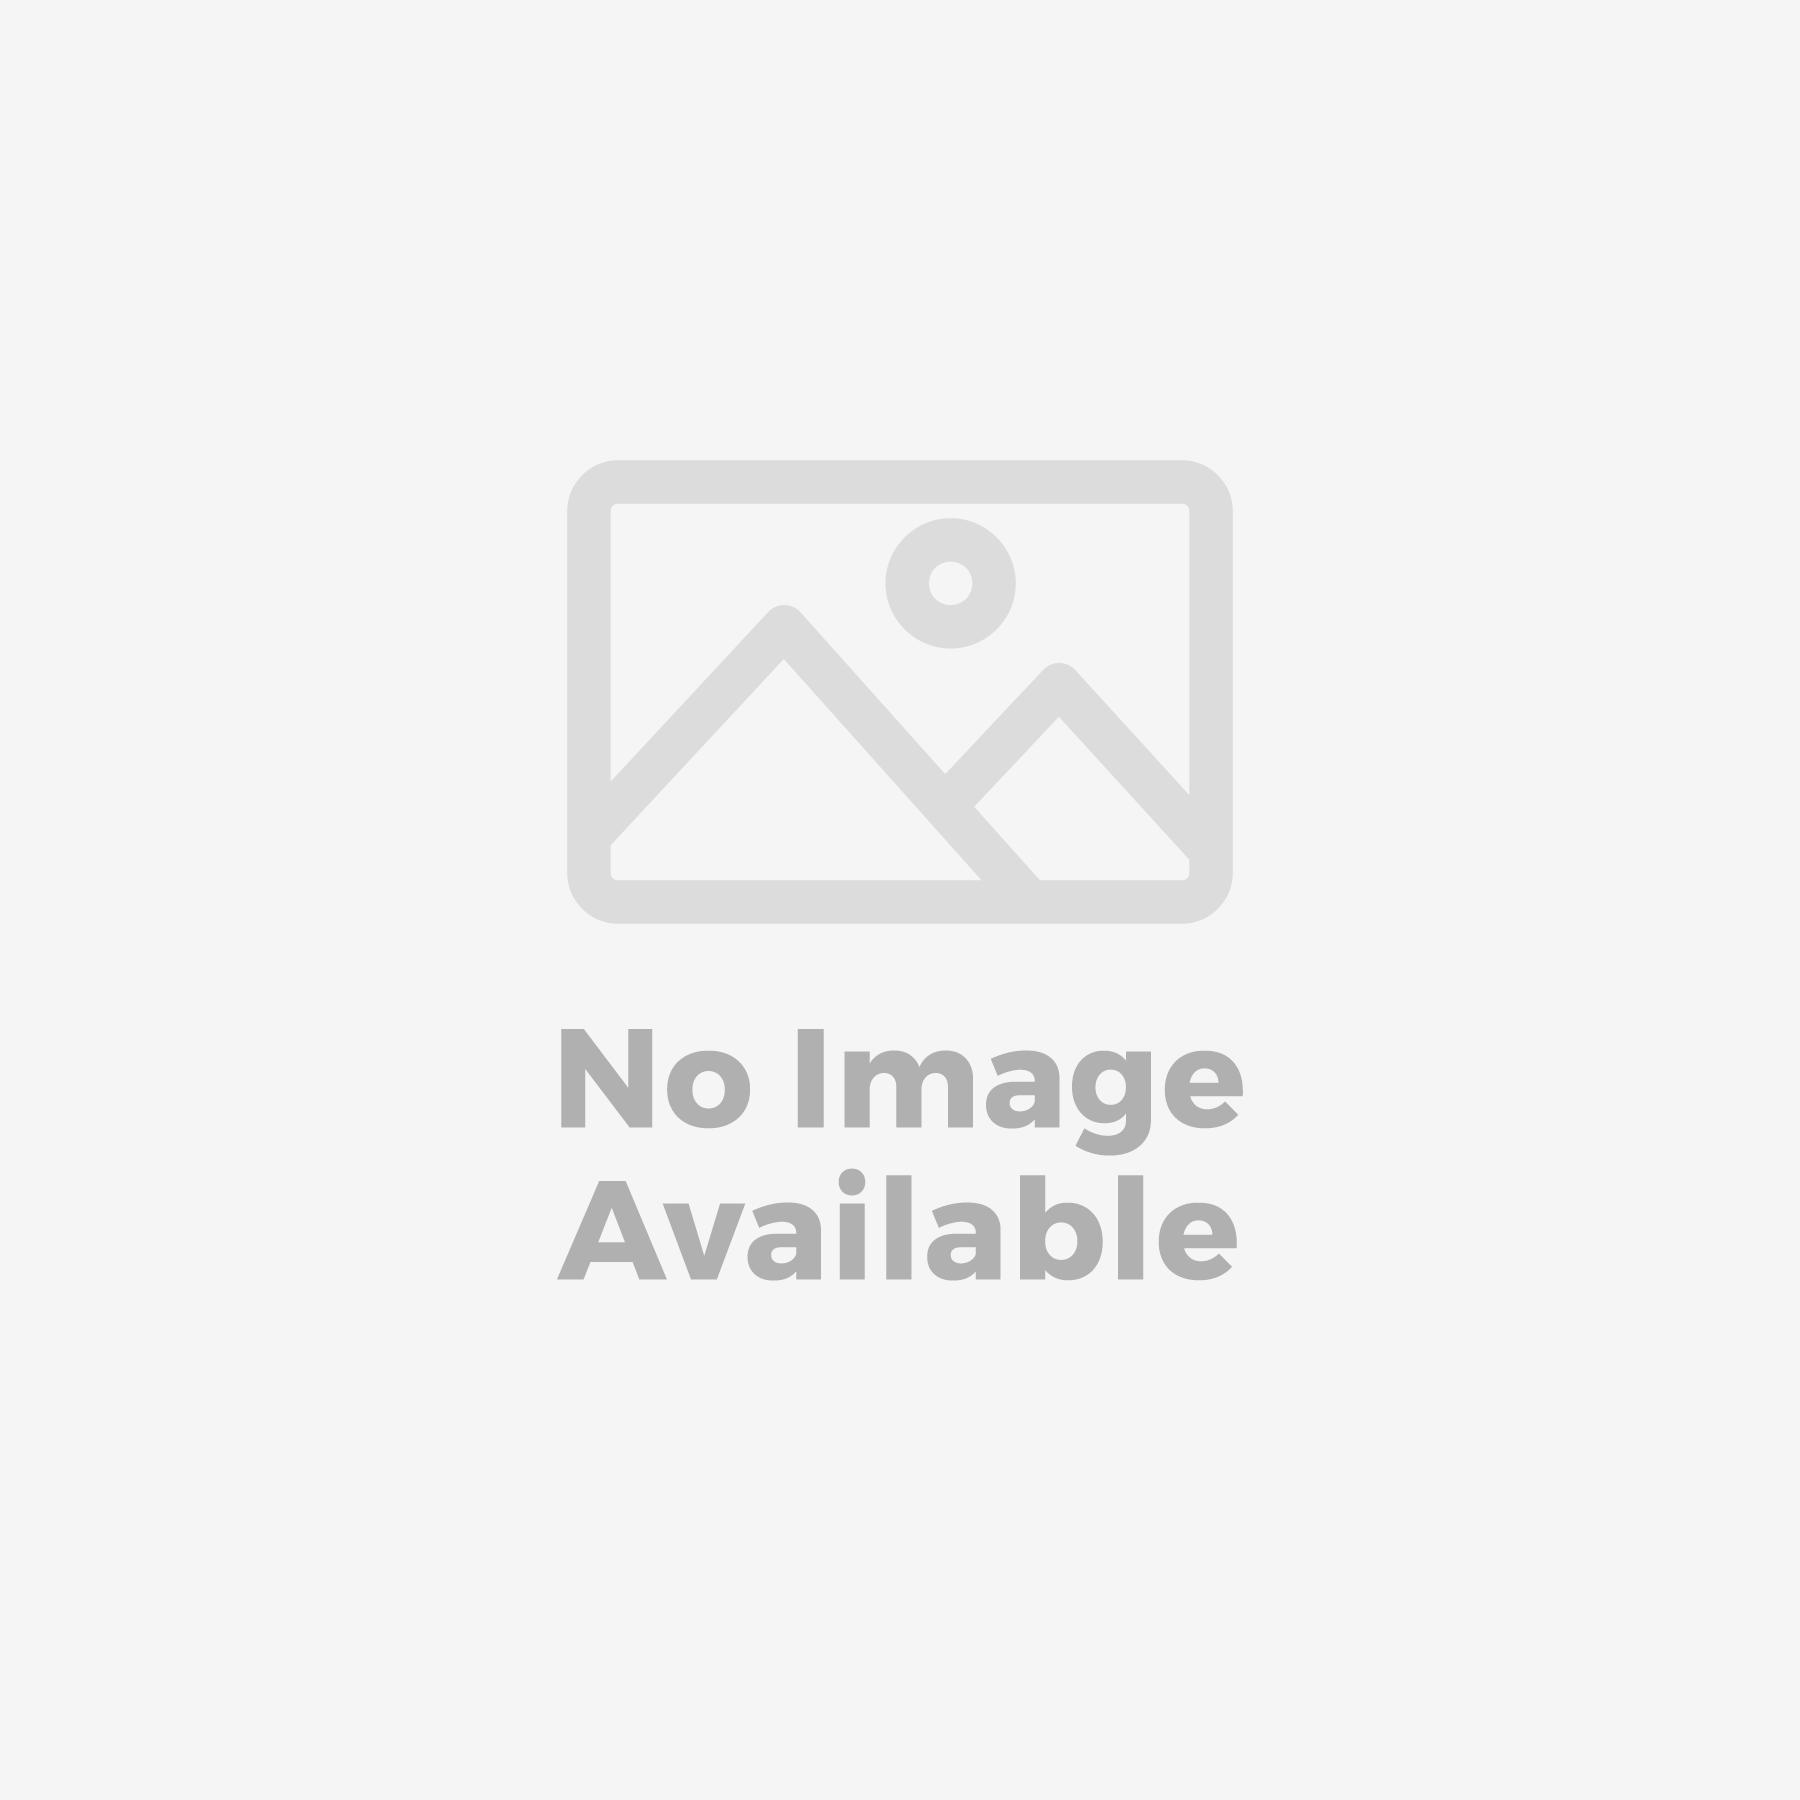 OMBRE PURPLE/GRAY GLASS VASE